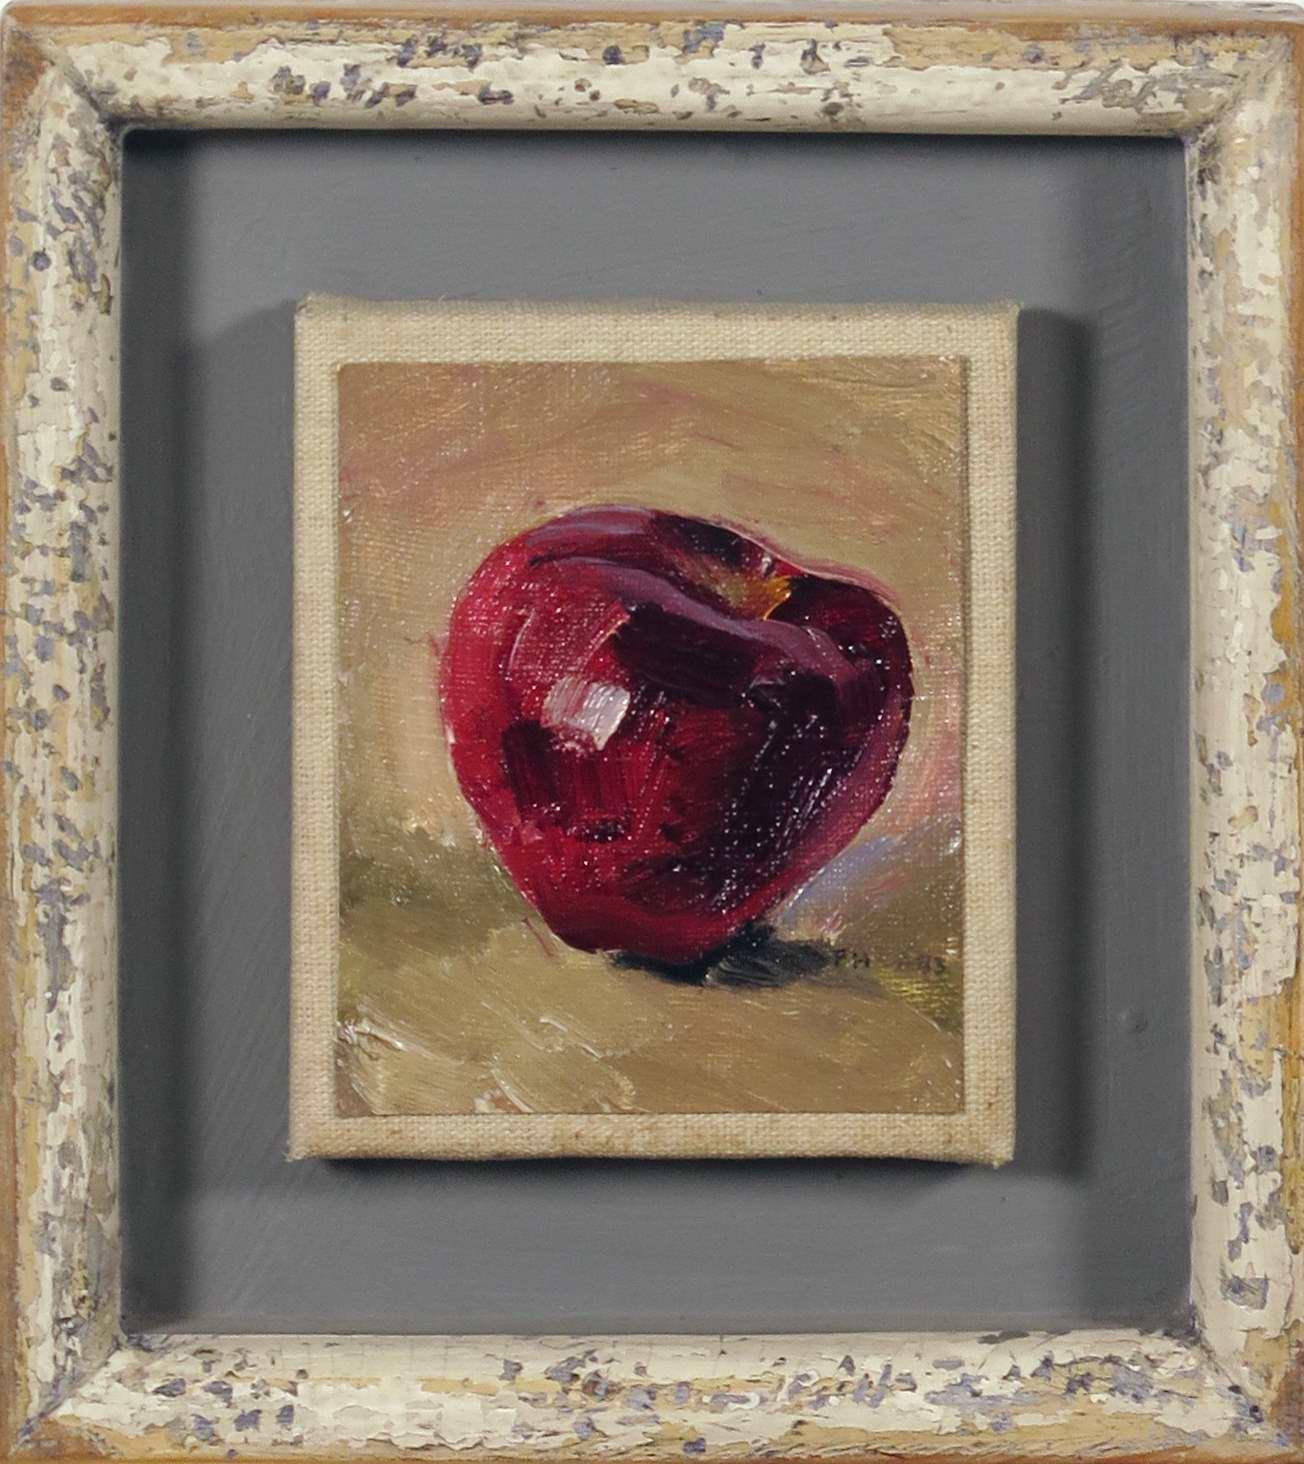 Frederick Hammersley, Adam's Apple #2